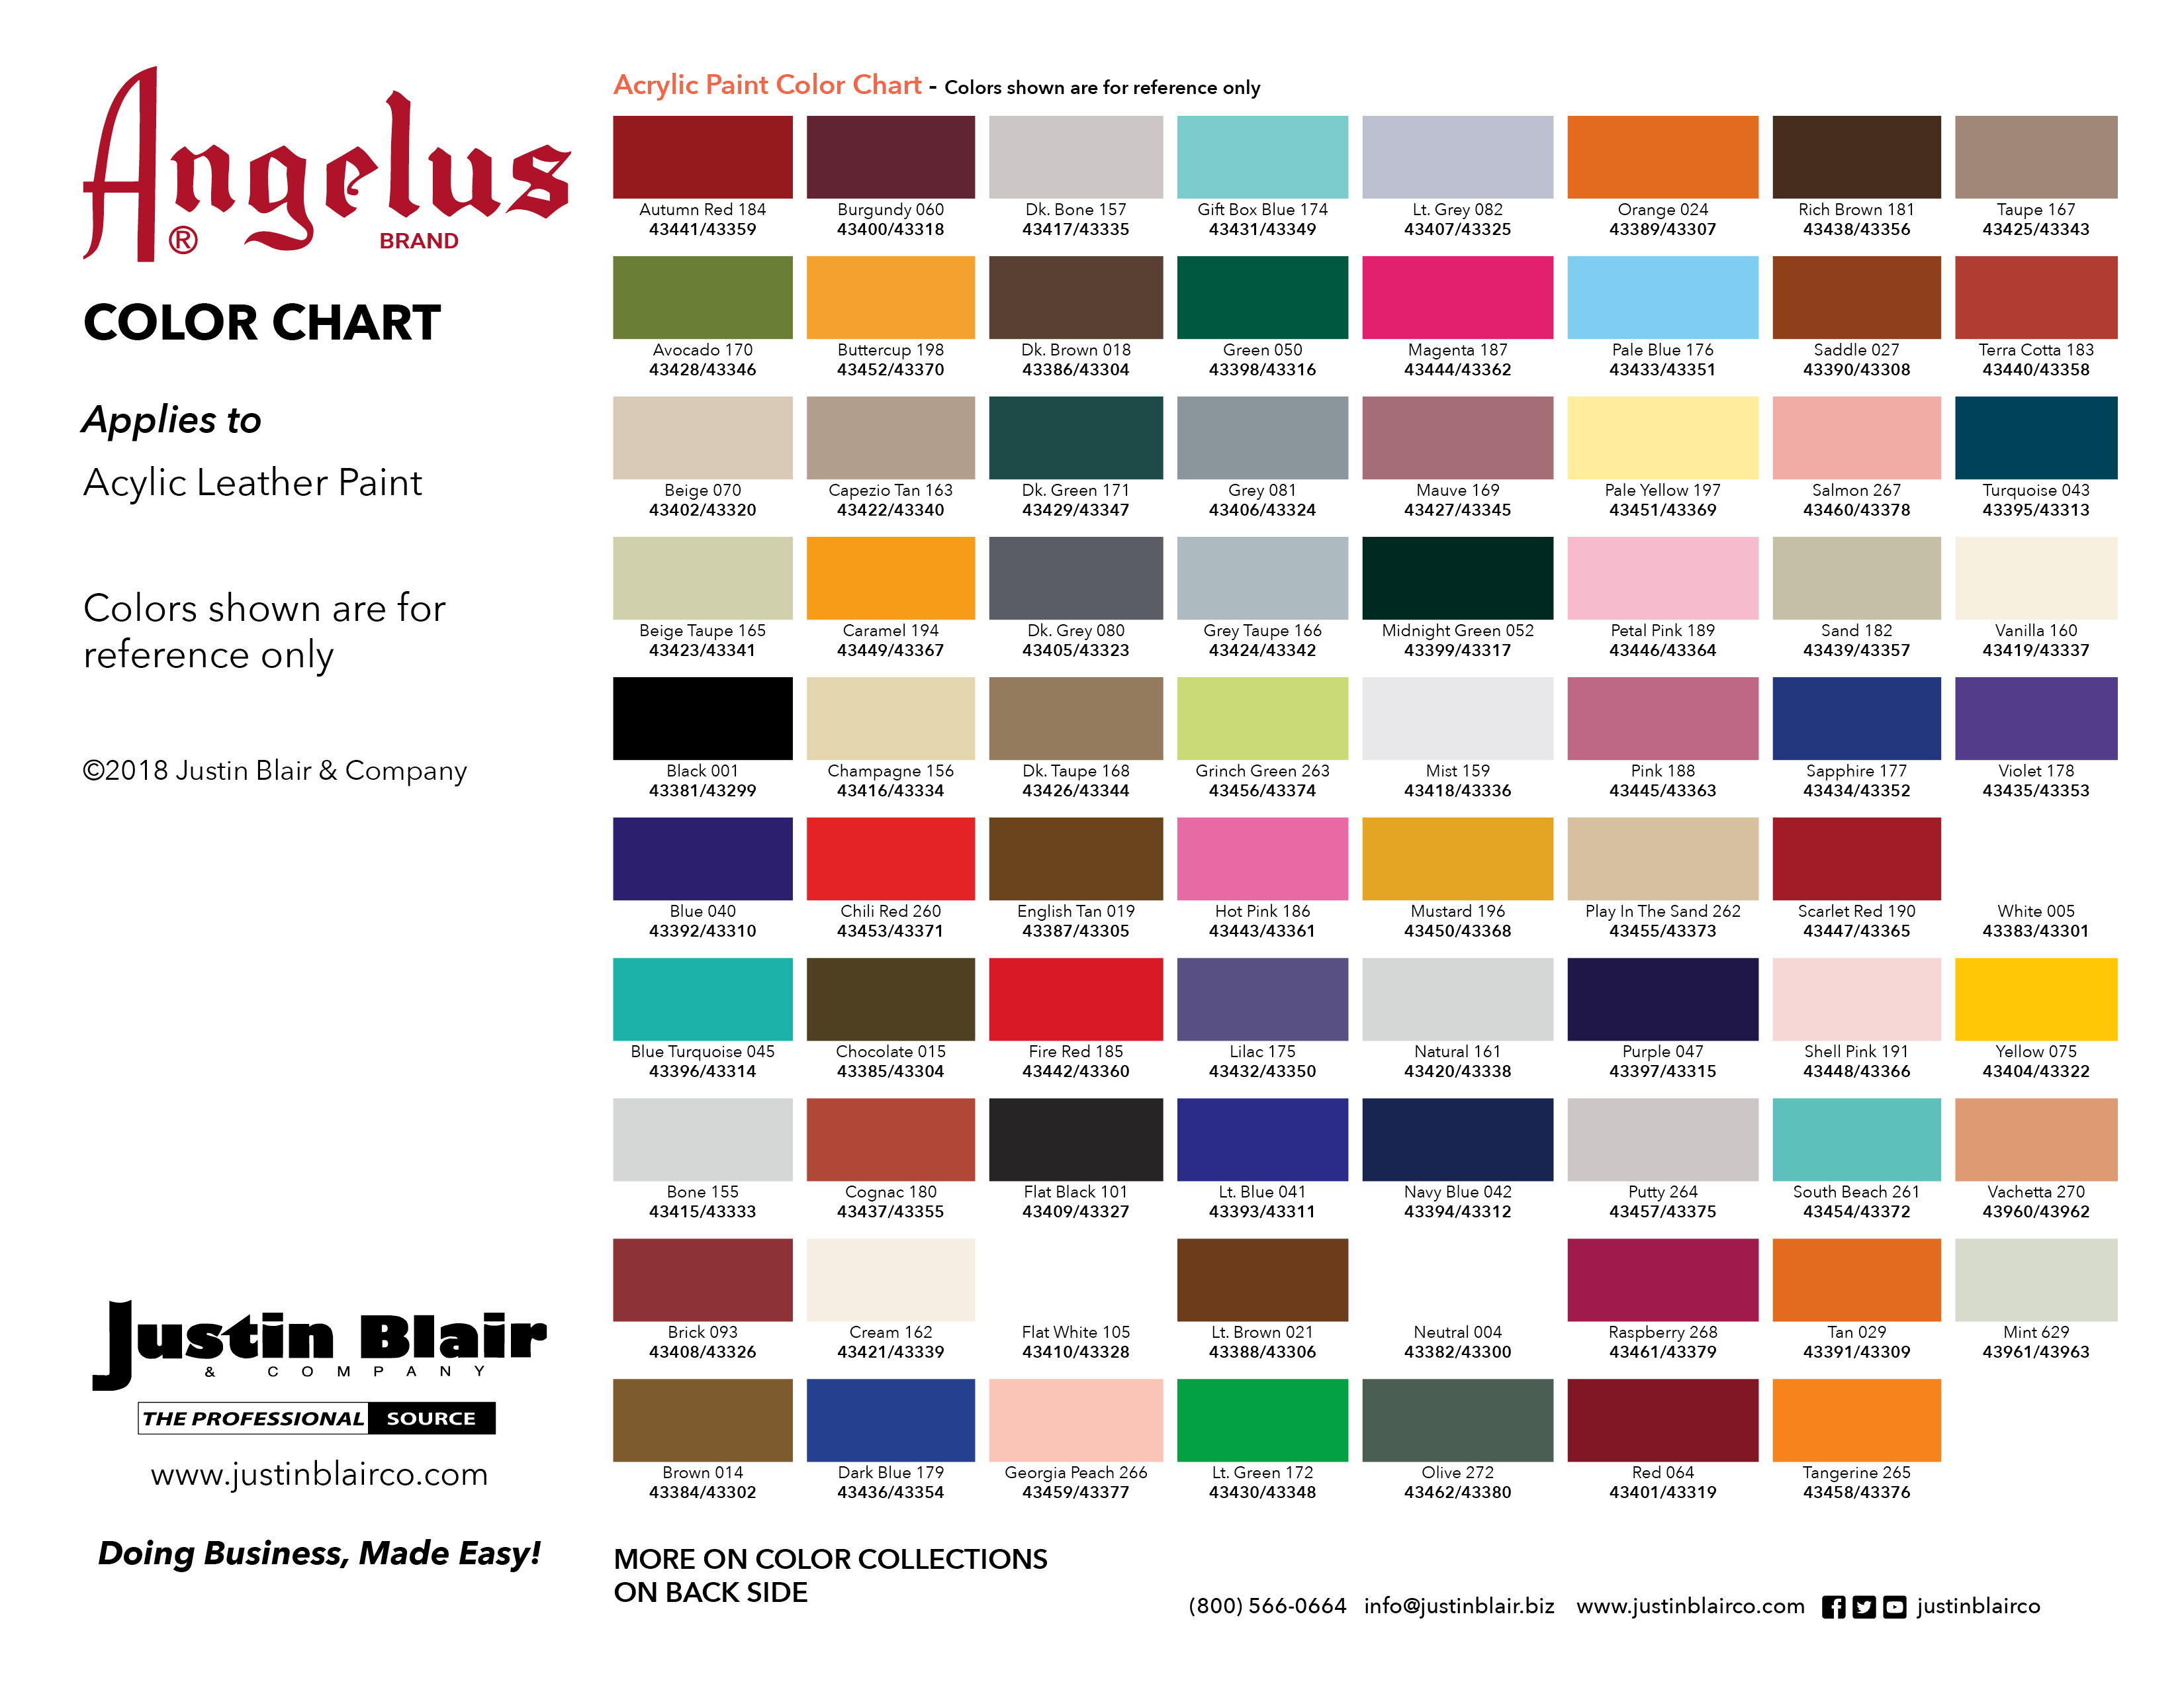 Angelus Acrylic Paint Color Chart